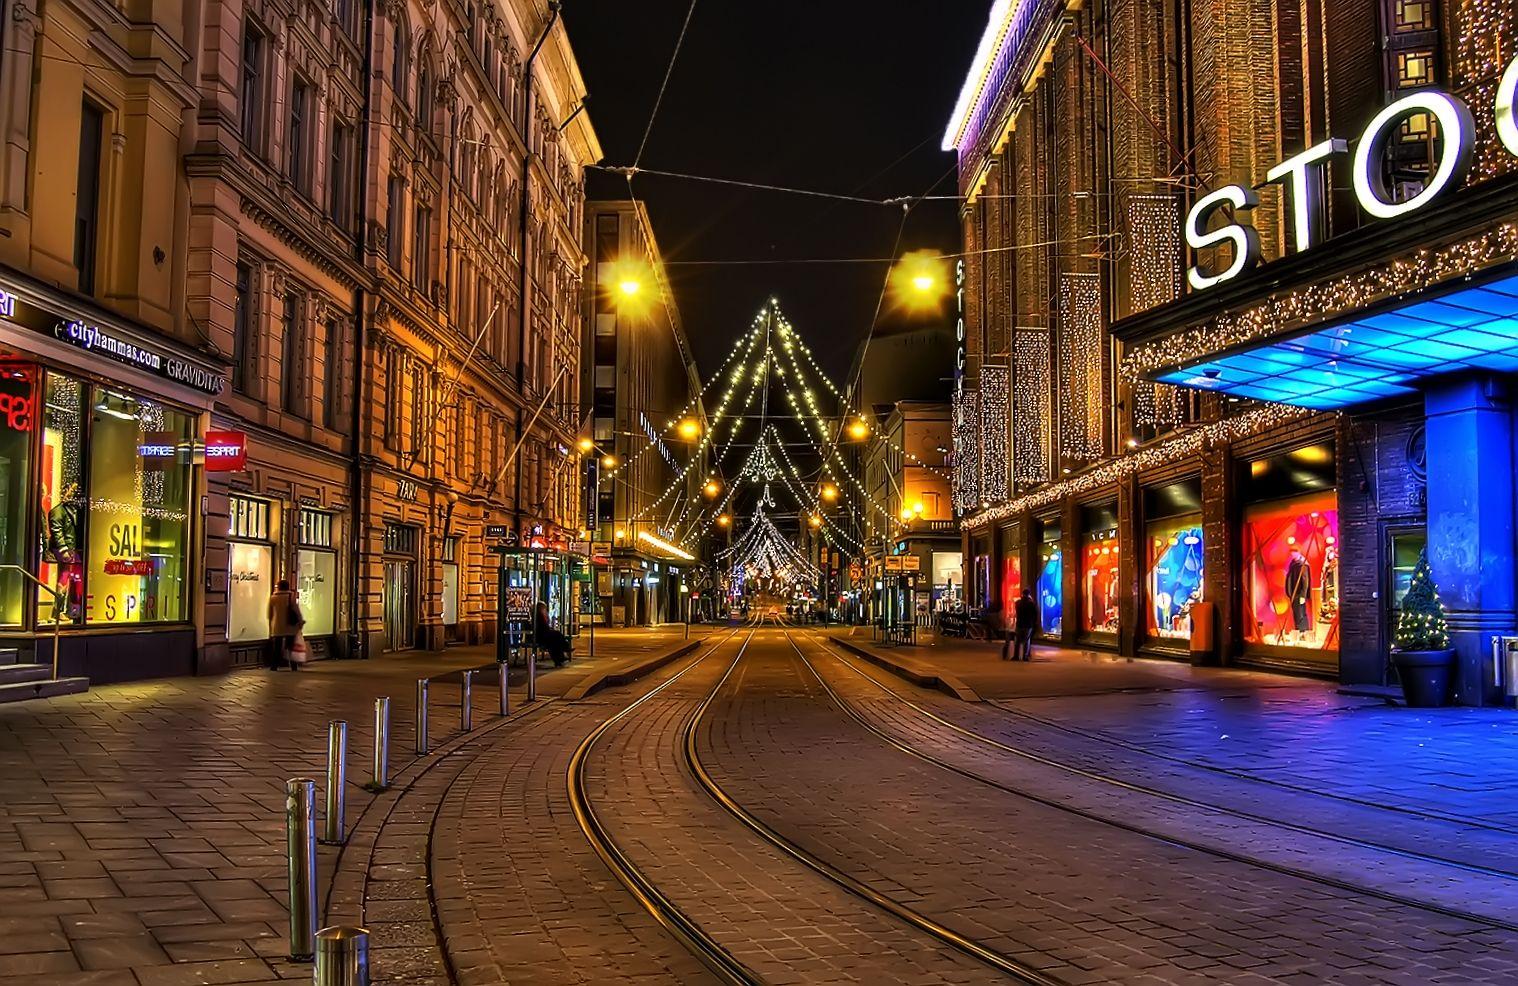 Helsinki Stockmann Aleksanterinkatu Helsinki Hdr Photos Favorite Places